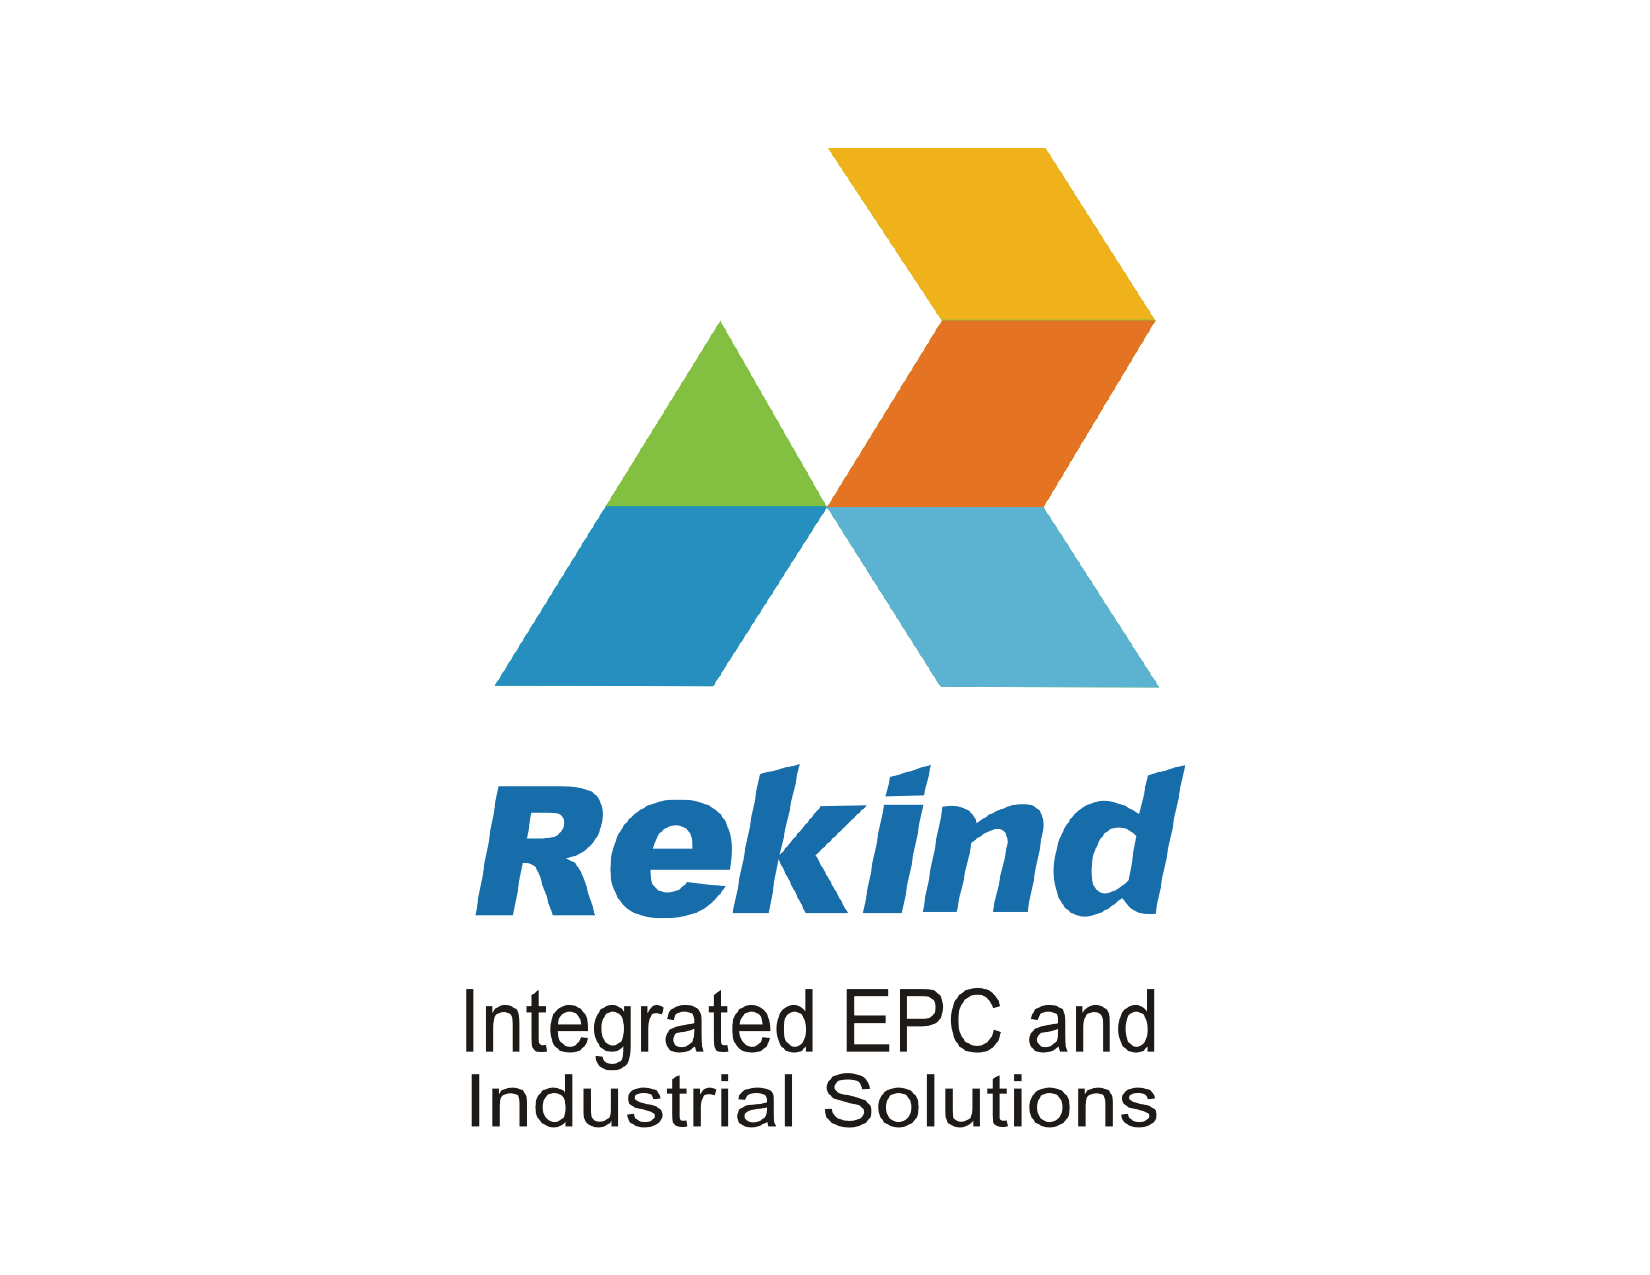 logo rekind